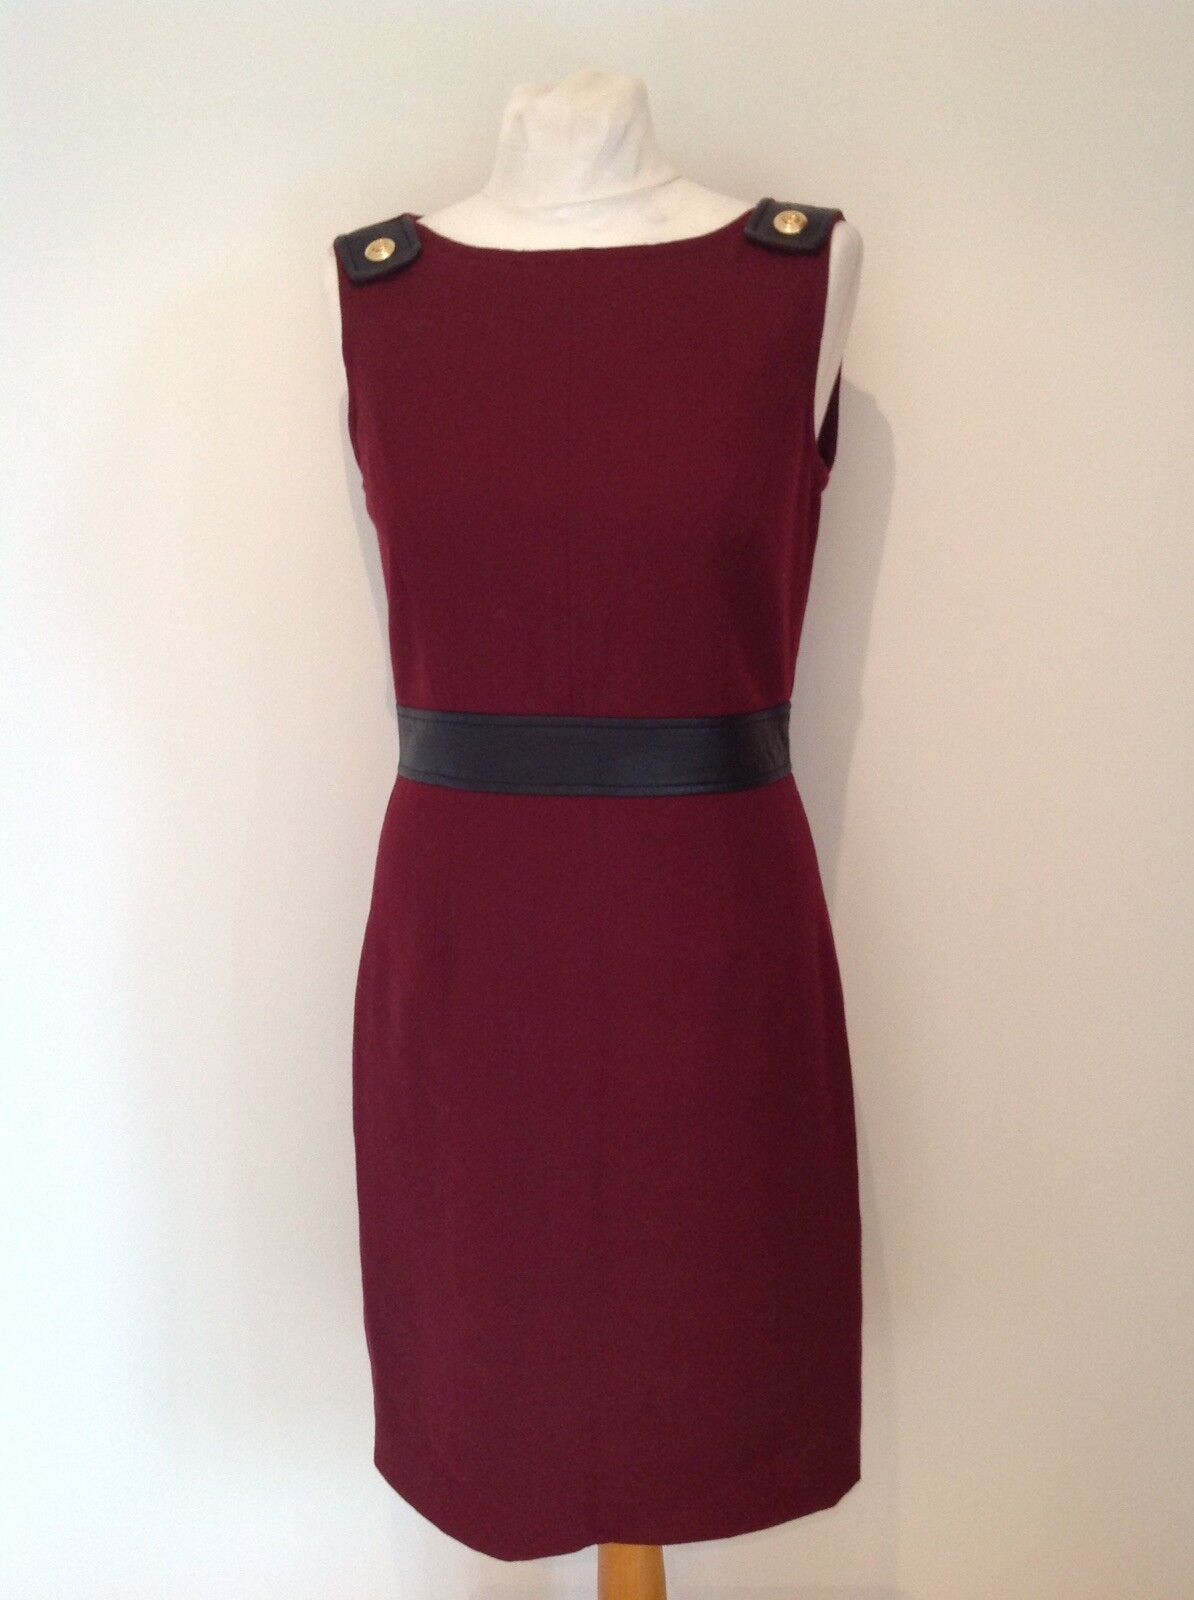 TORY BURCH damen LADIES WOOL BLEND DRESS Größe  USA 4